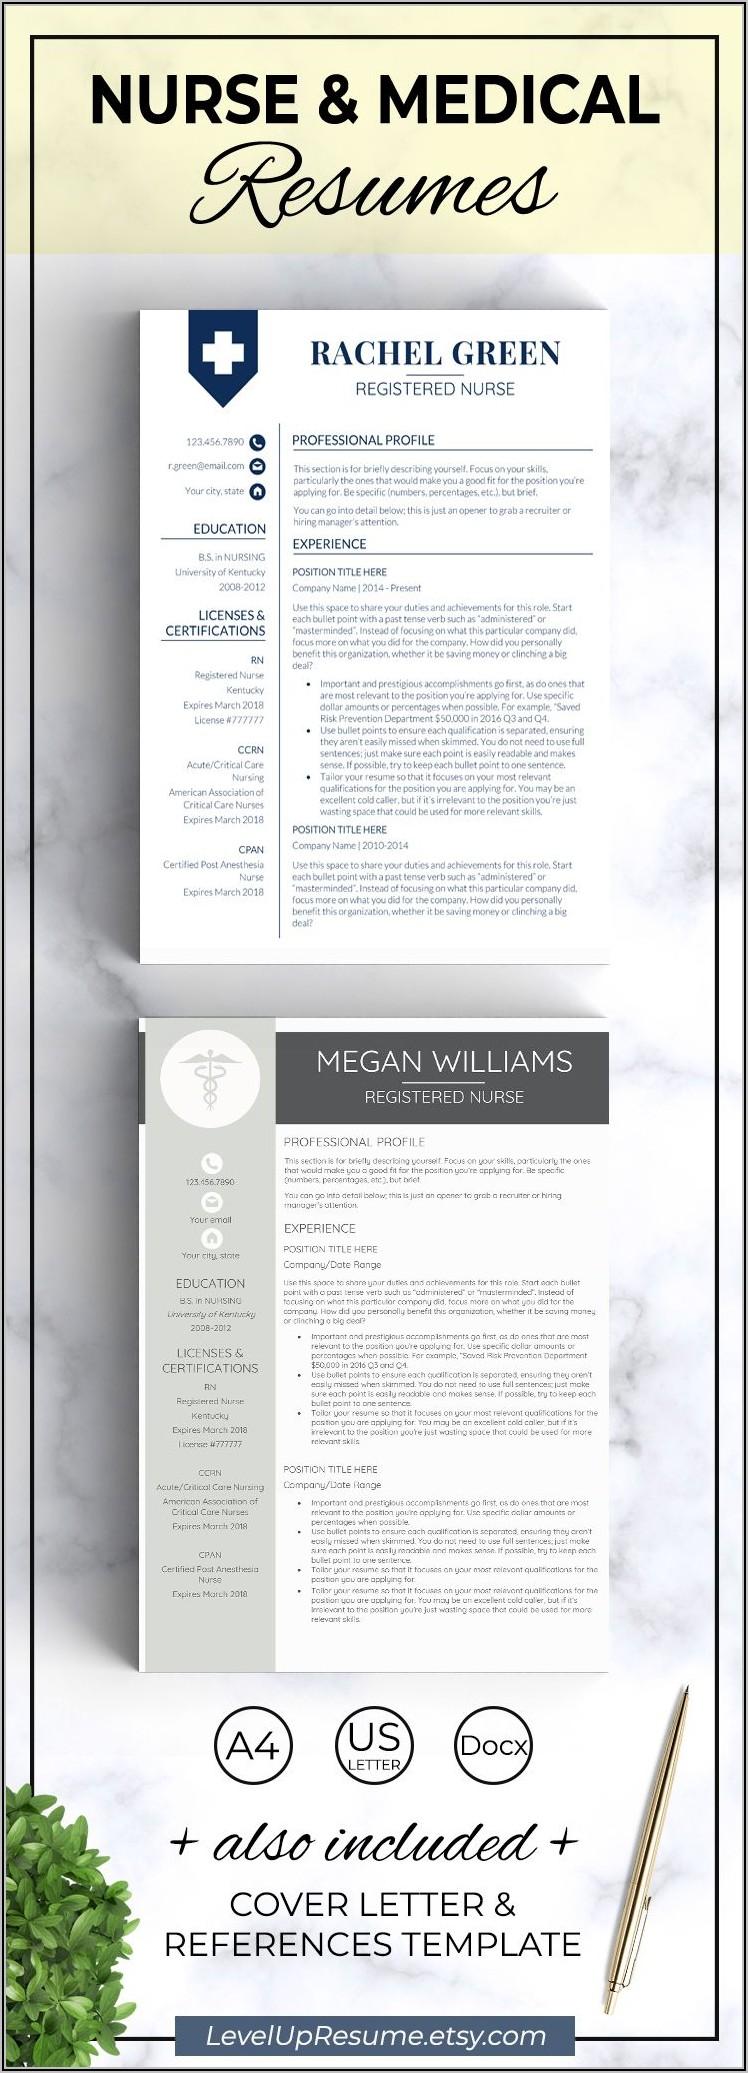 Registered Nurse New Grad Resume